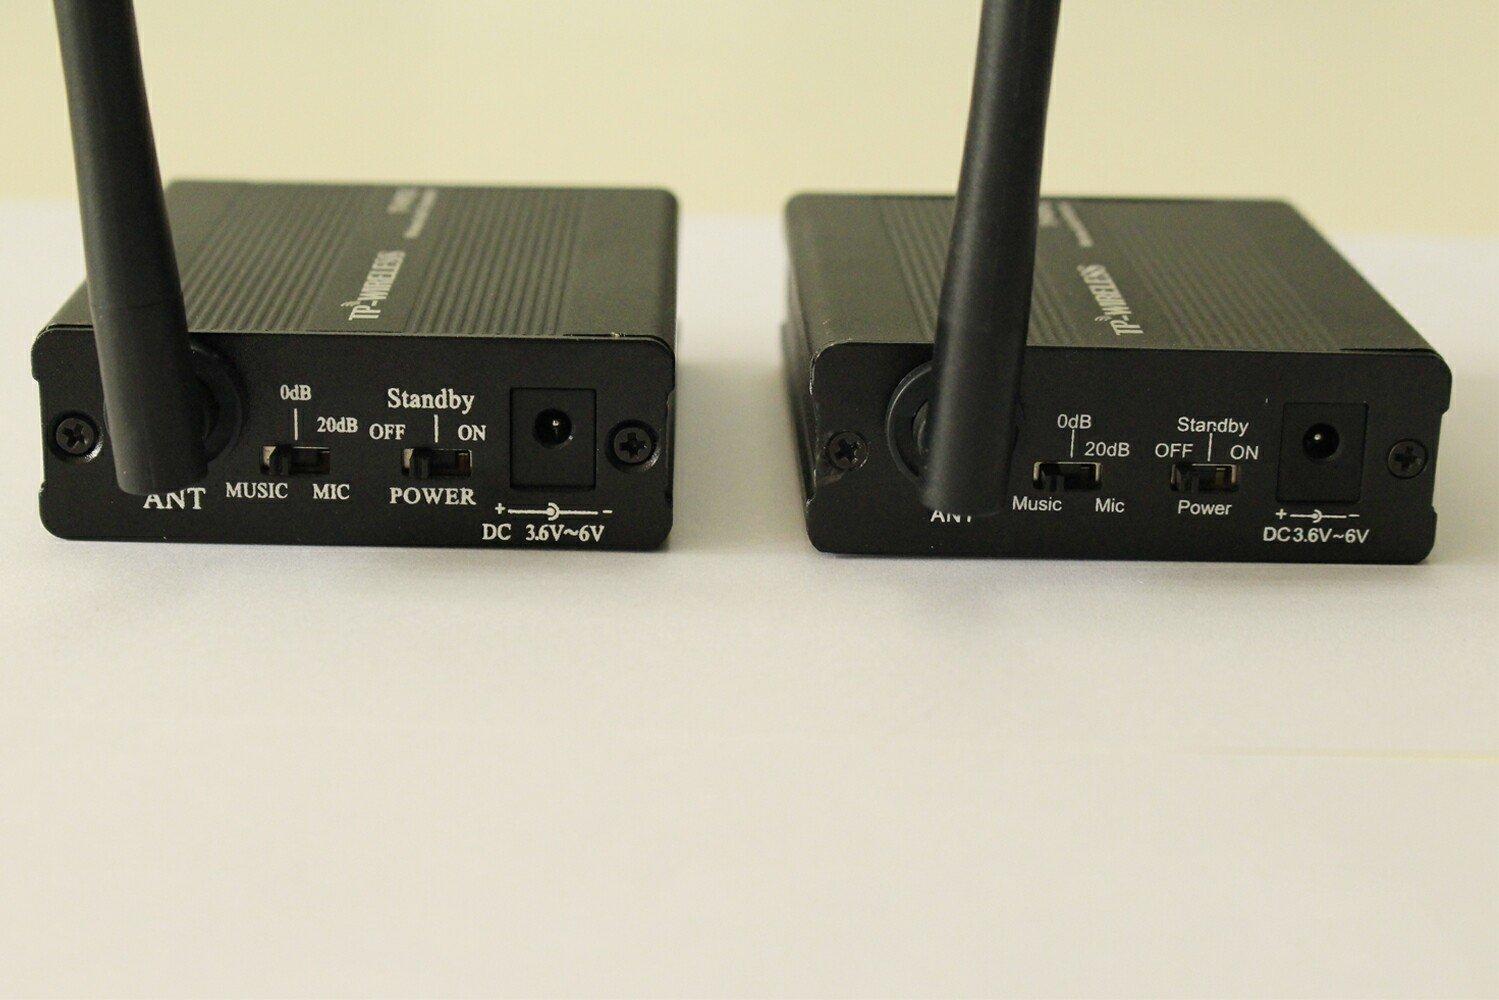 TP-WIRELESS 2.4GHz Digital Wireless HDCD Audio Adapter Music Sound Transmitter and Receiver (1 Transmitter and 1 Receiver) by TP-WIRELESS